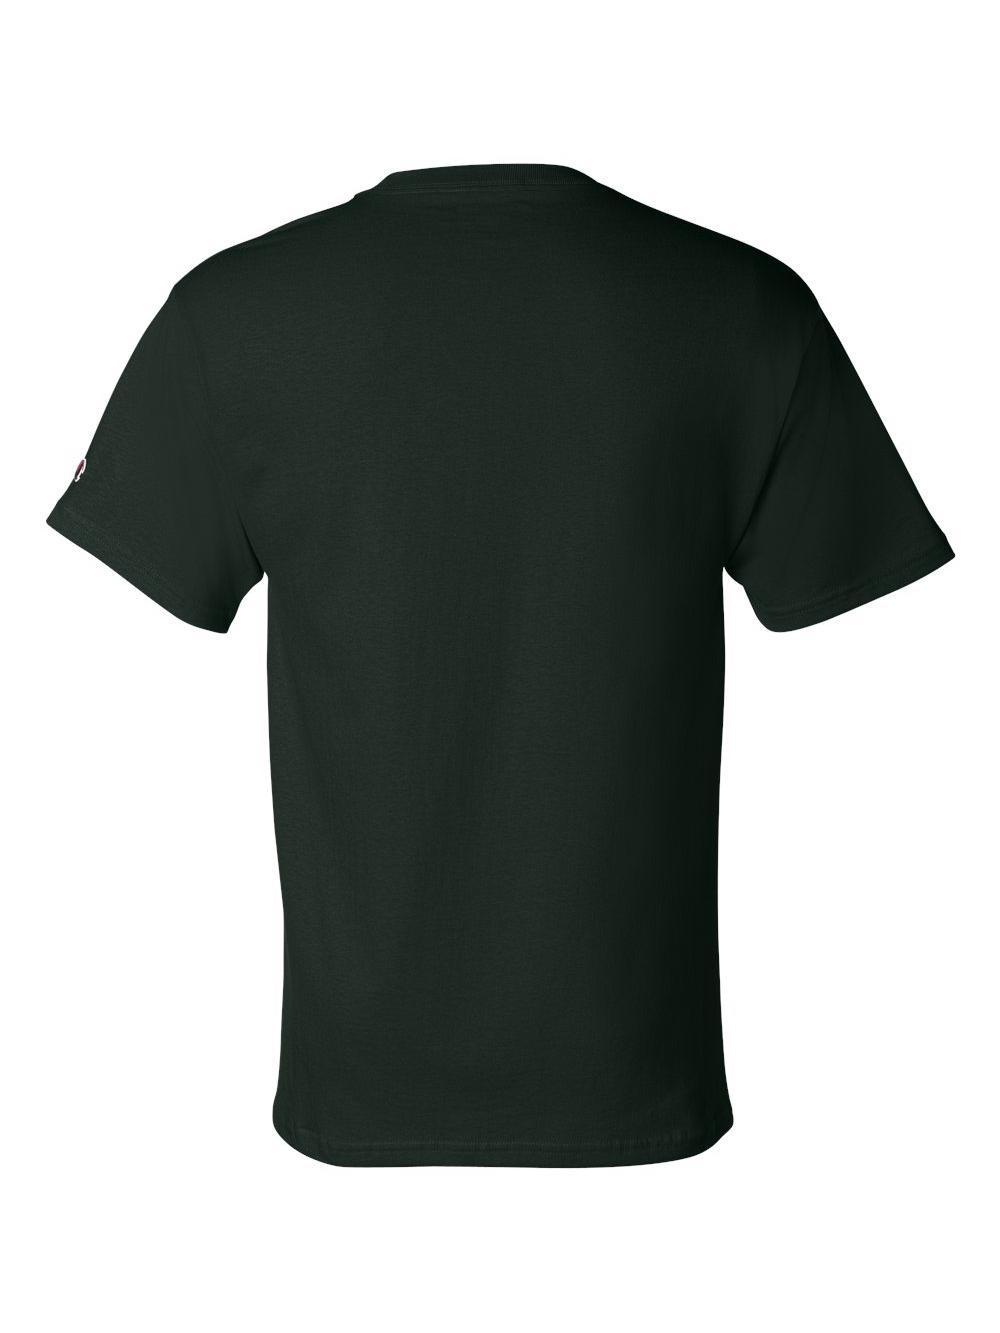 Champion-Short-Sleeve-T-Shirt-T425 thumbnail 13